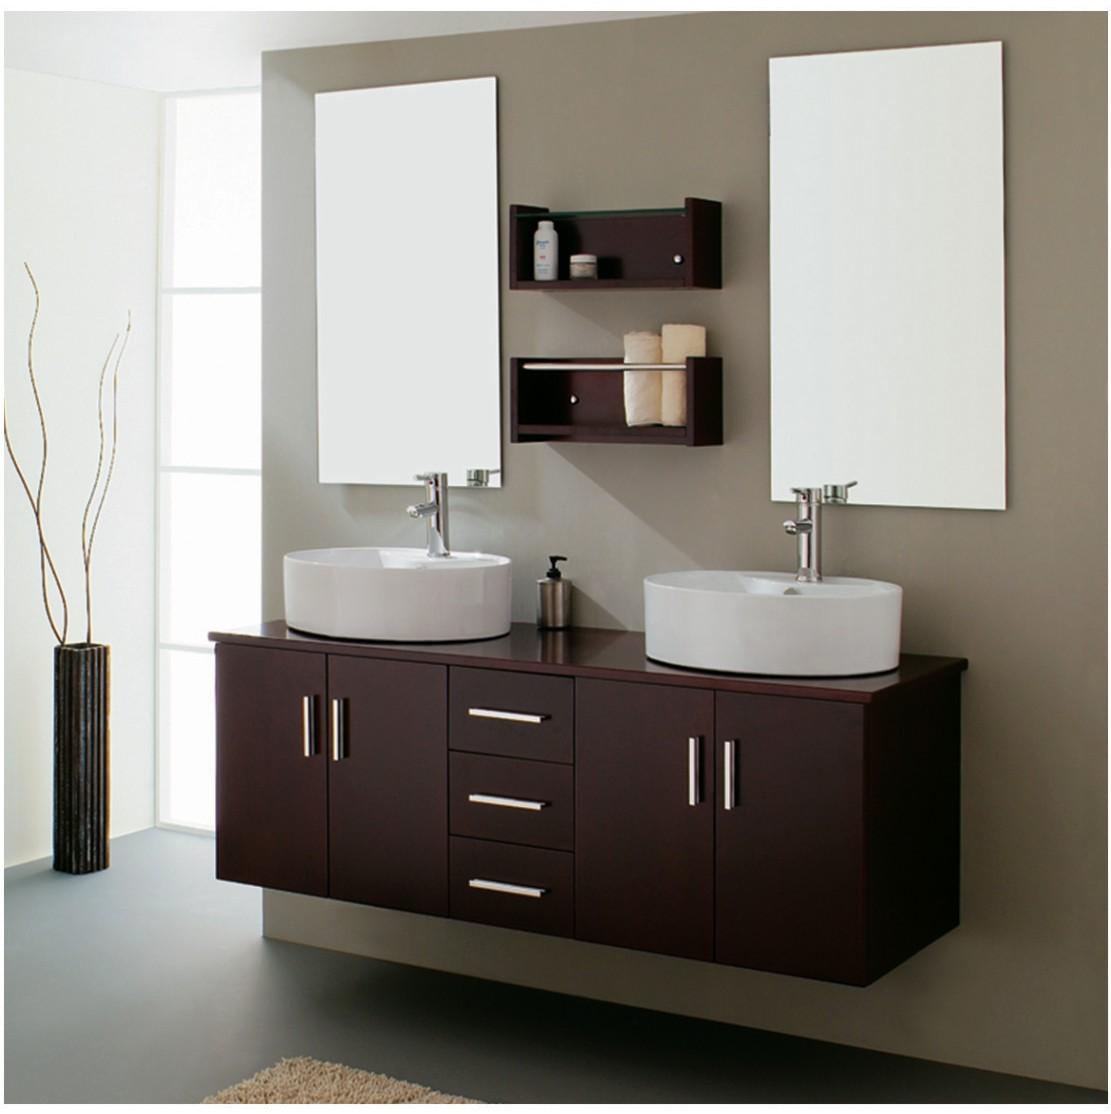 How to make bathroom vanity Photo - 1